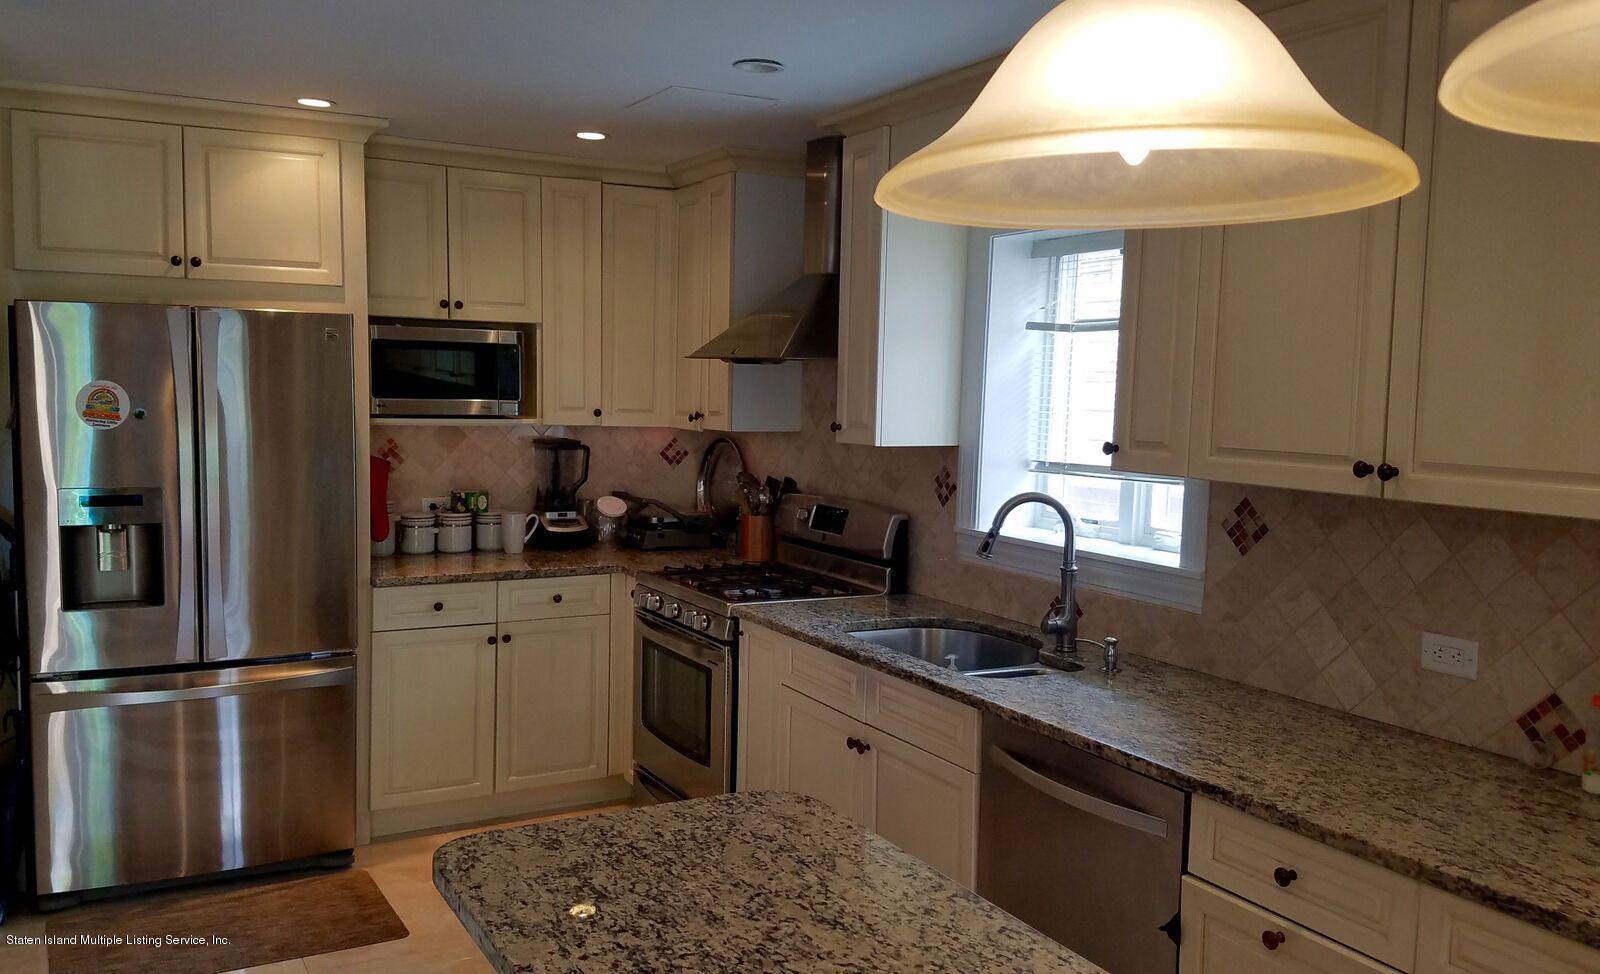 Single Family - Detached 104 Dutchess Ave   Staten Island, NY 10304, MLS-1113043-8